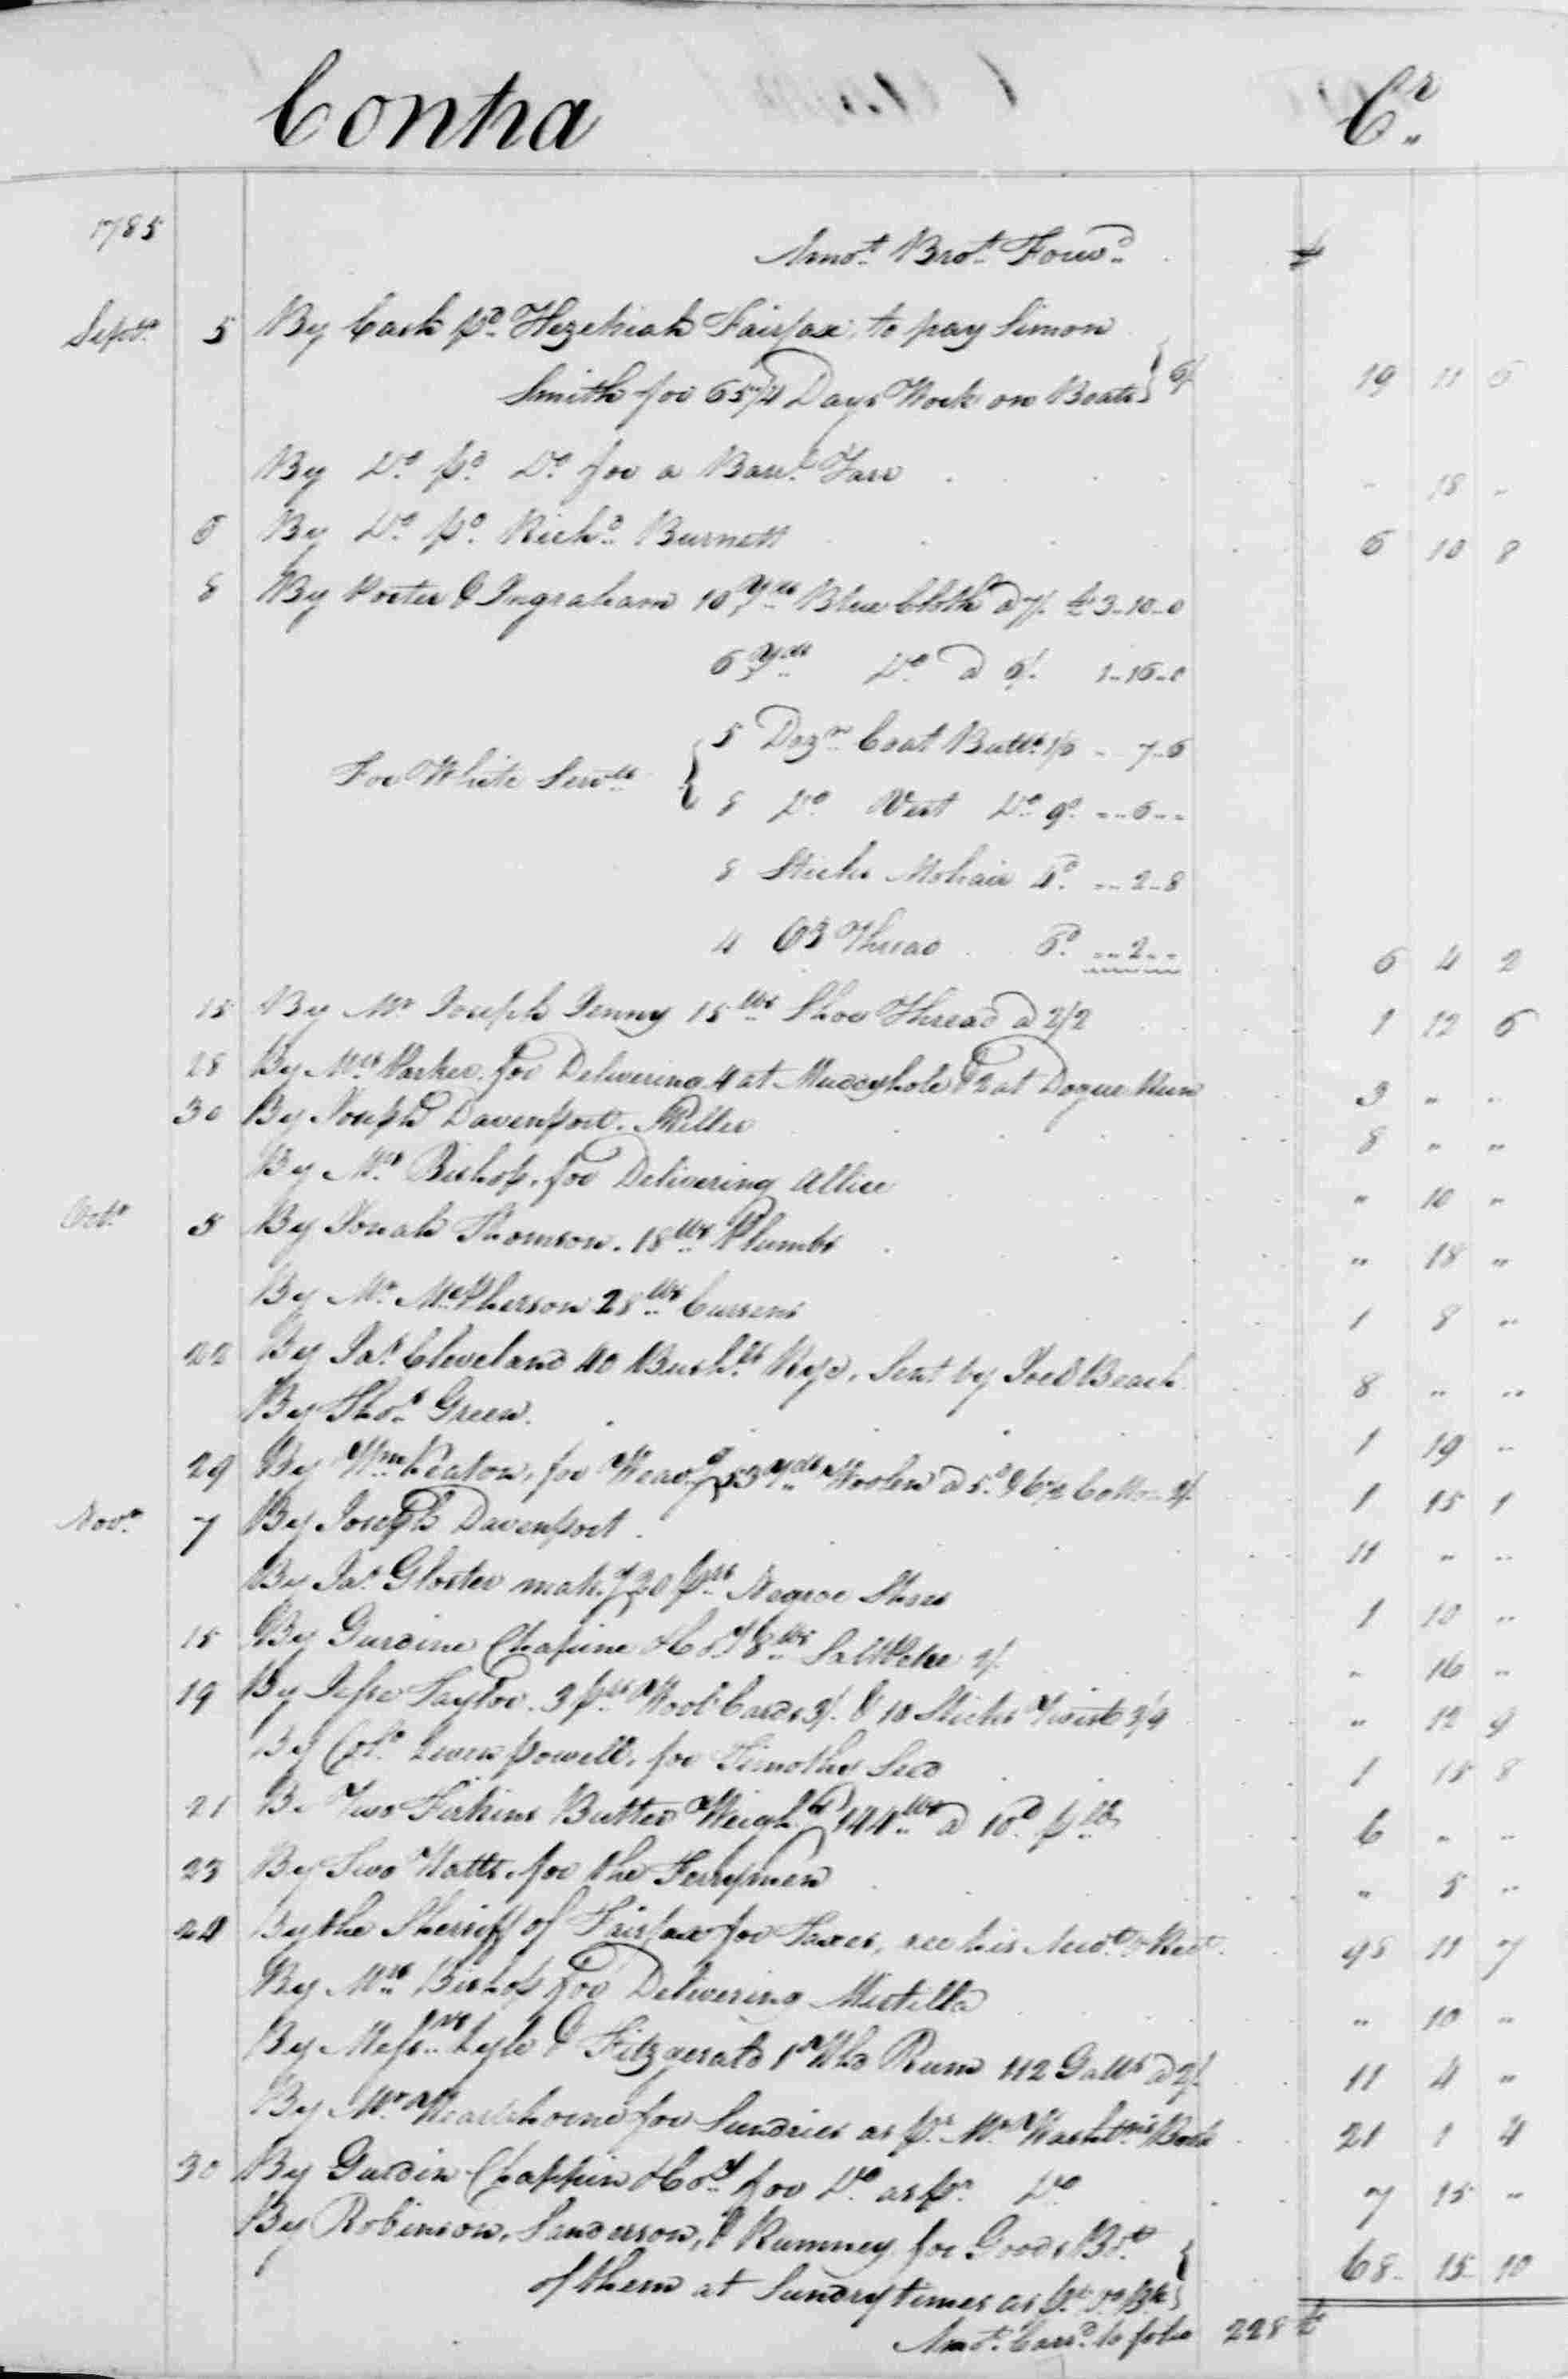 Ledger B, folio 189, right side